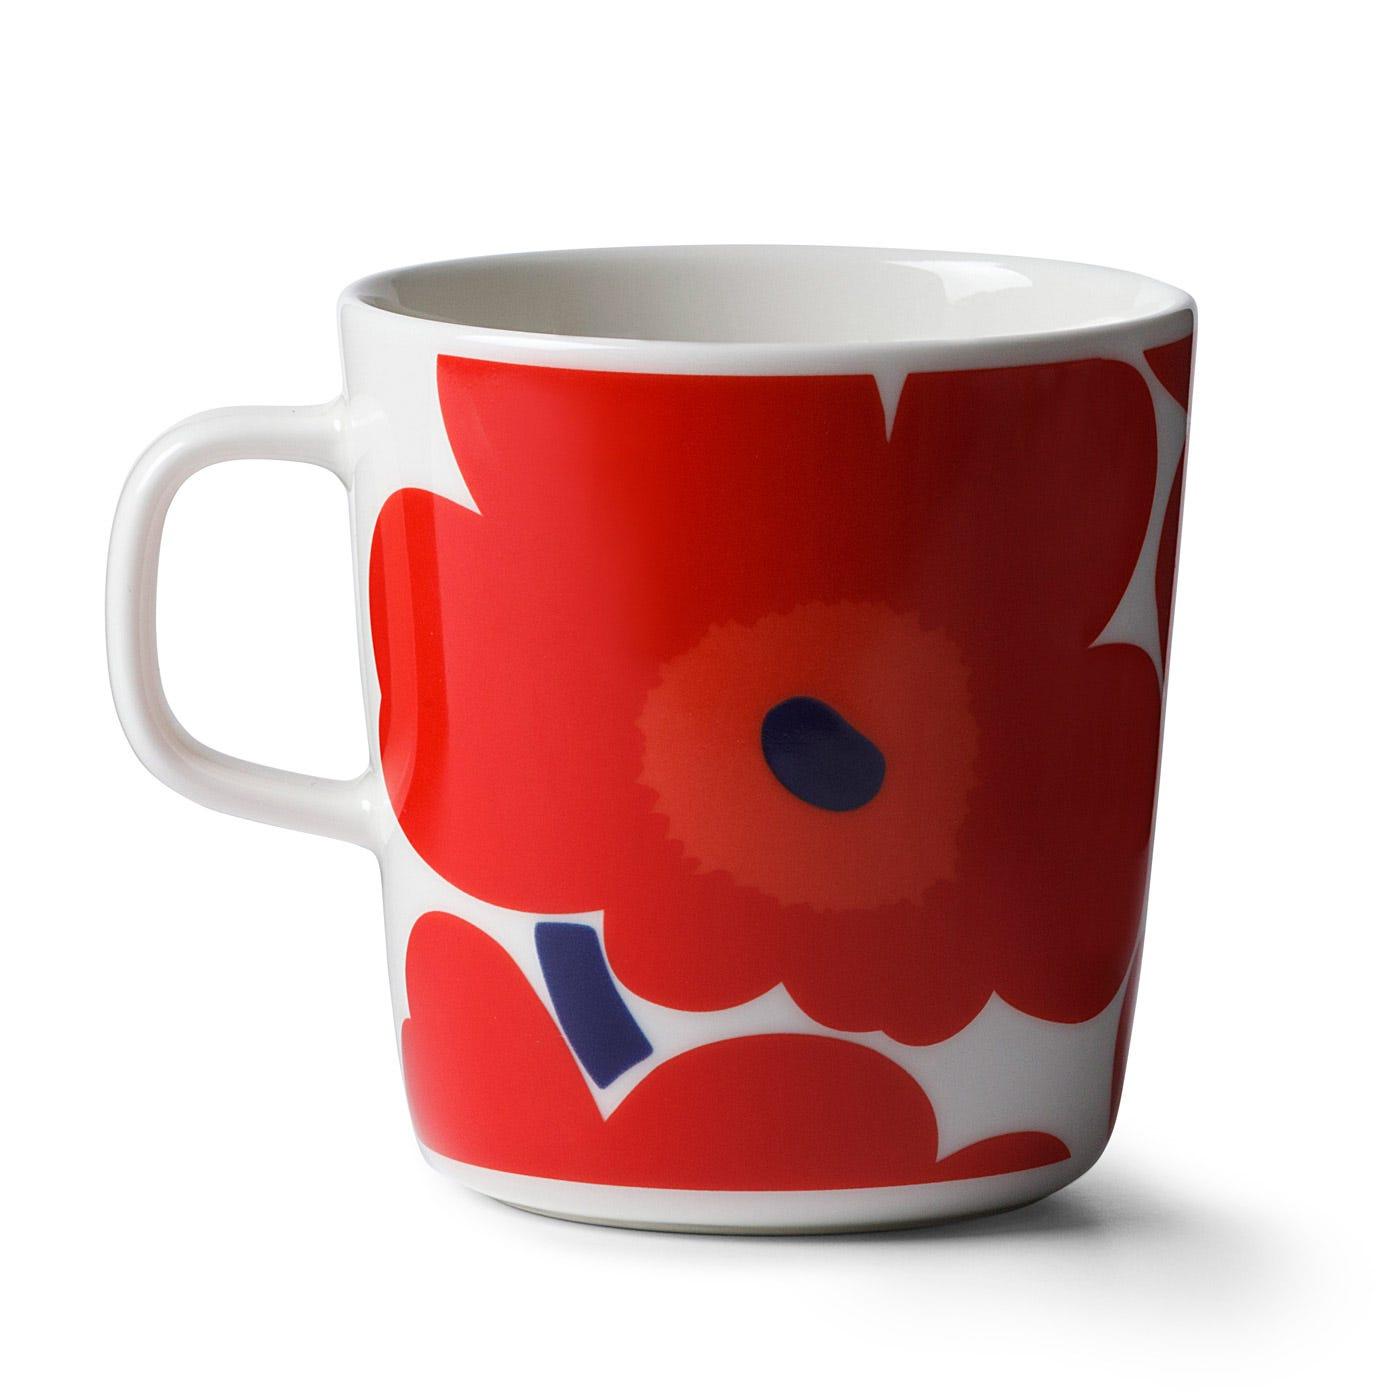 Unikko Mug Large